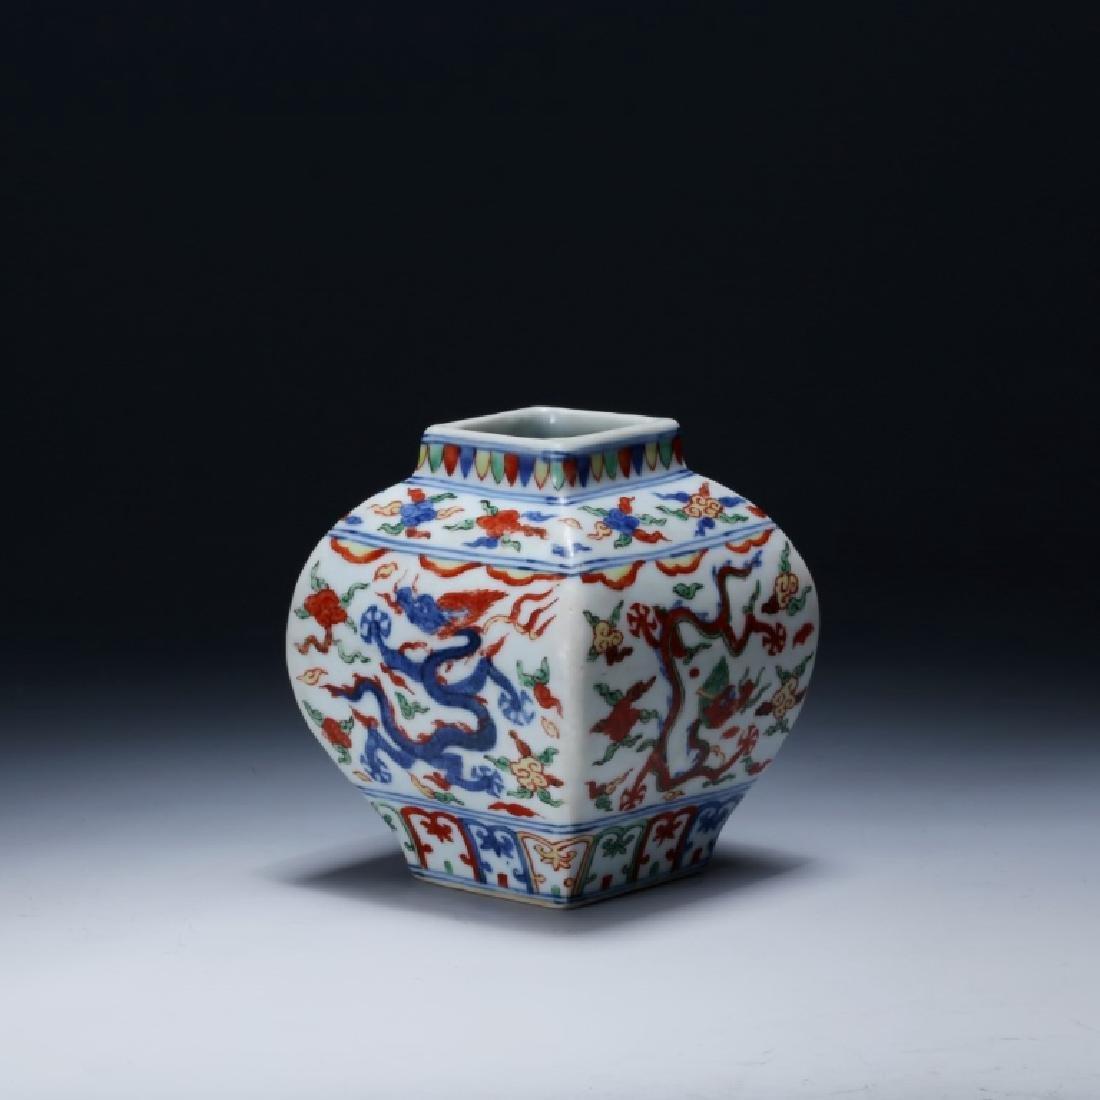 Chinese Qing Dynasty Wucai Porcelain Jar - 2